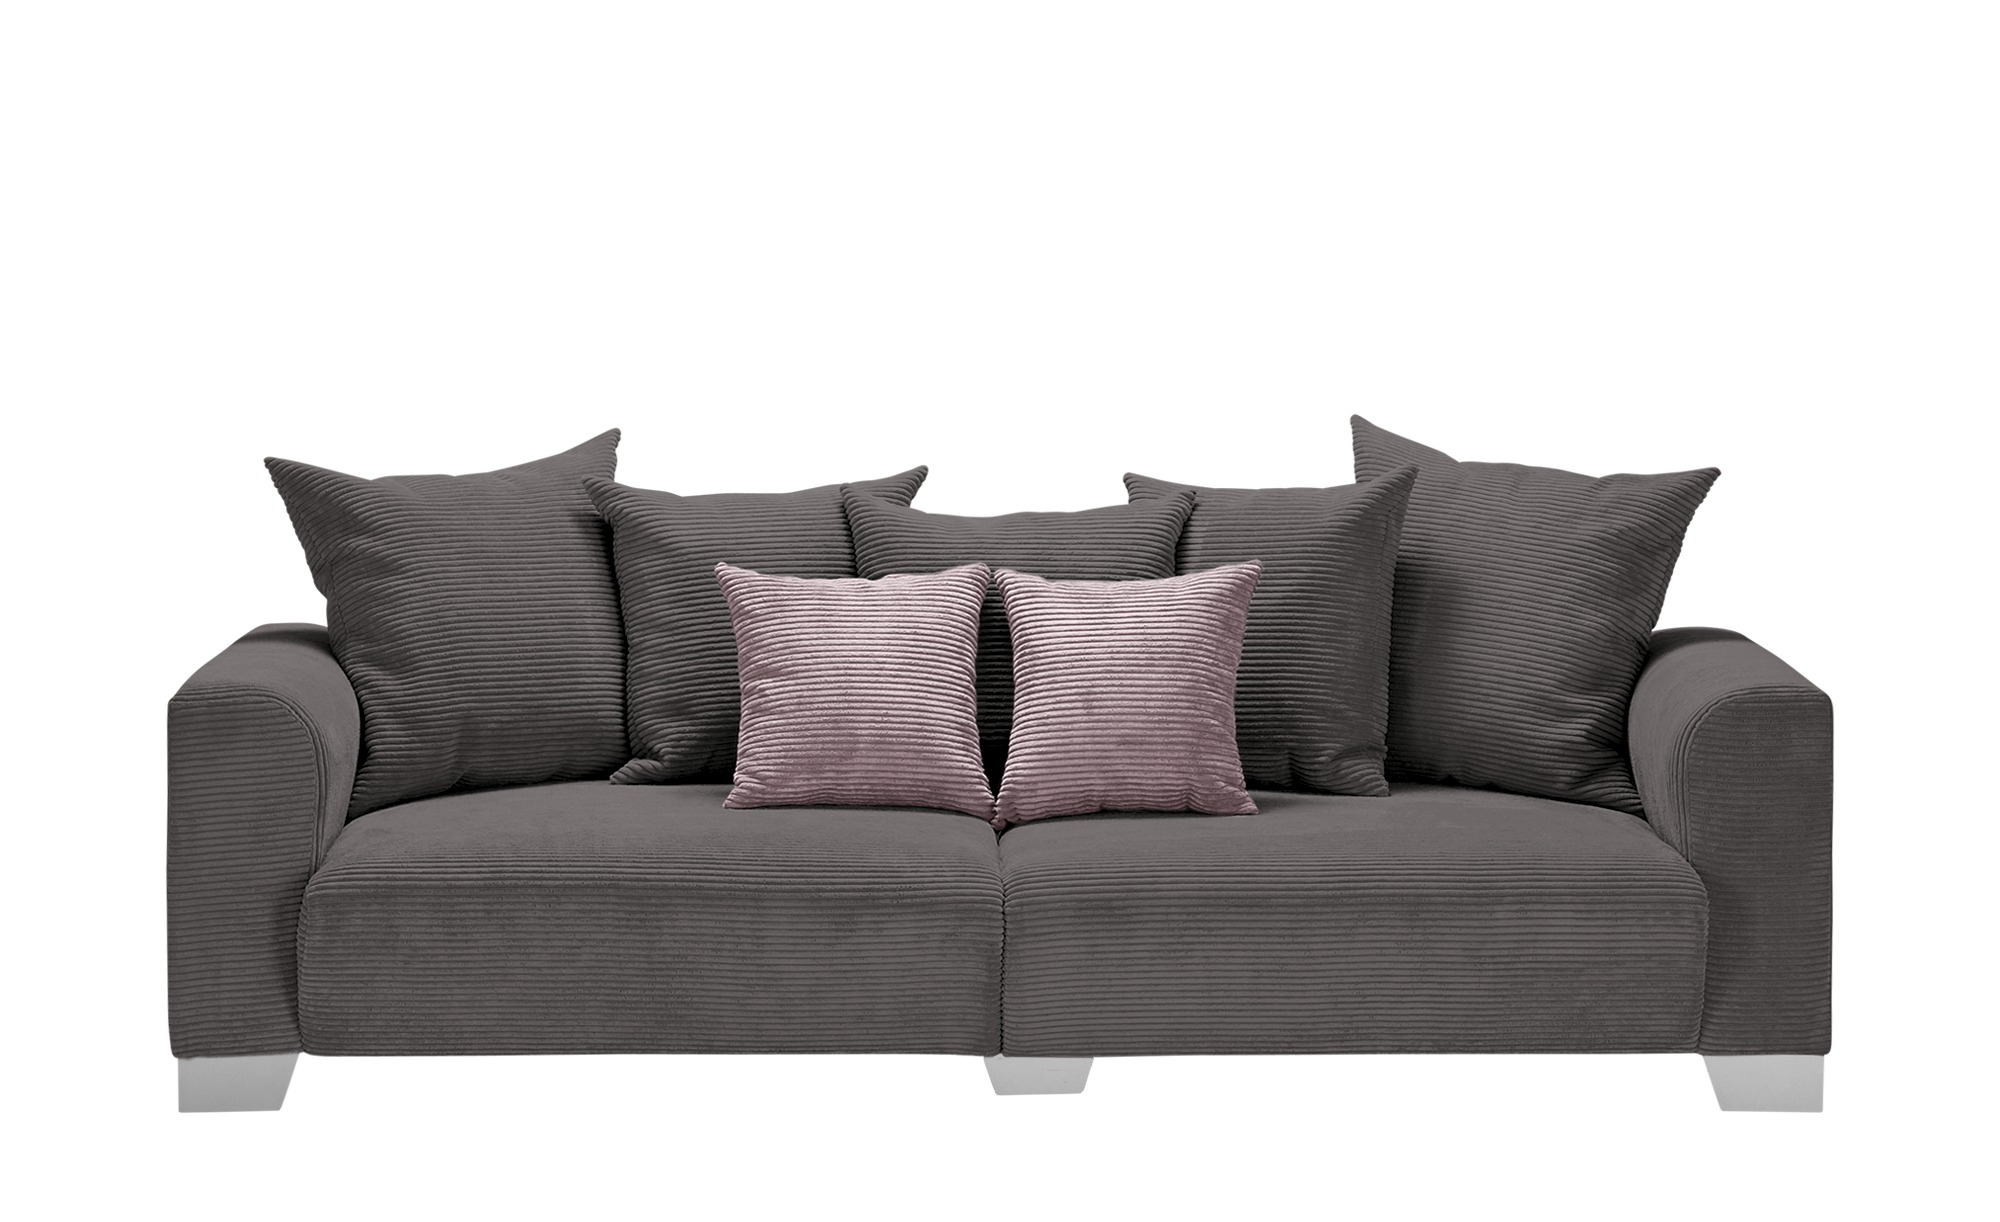 smart Big Sofa  Tonja ¦ grau ¦ Maße (cm): B: 244 H: 68 T: 107 Polstermöbel > Sofas > Big-Sofas - Höffner